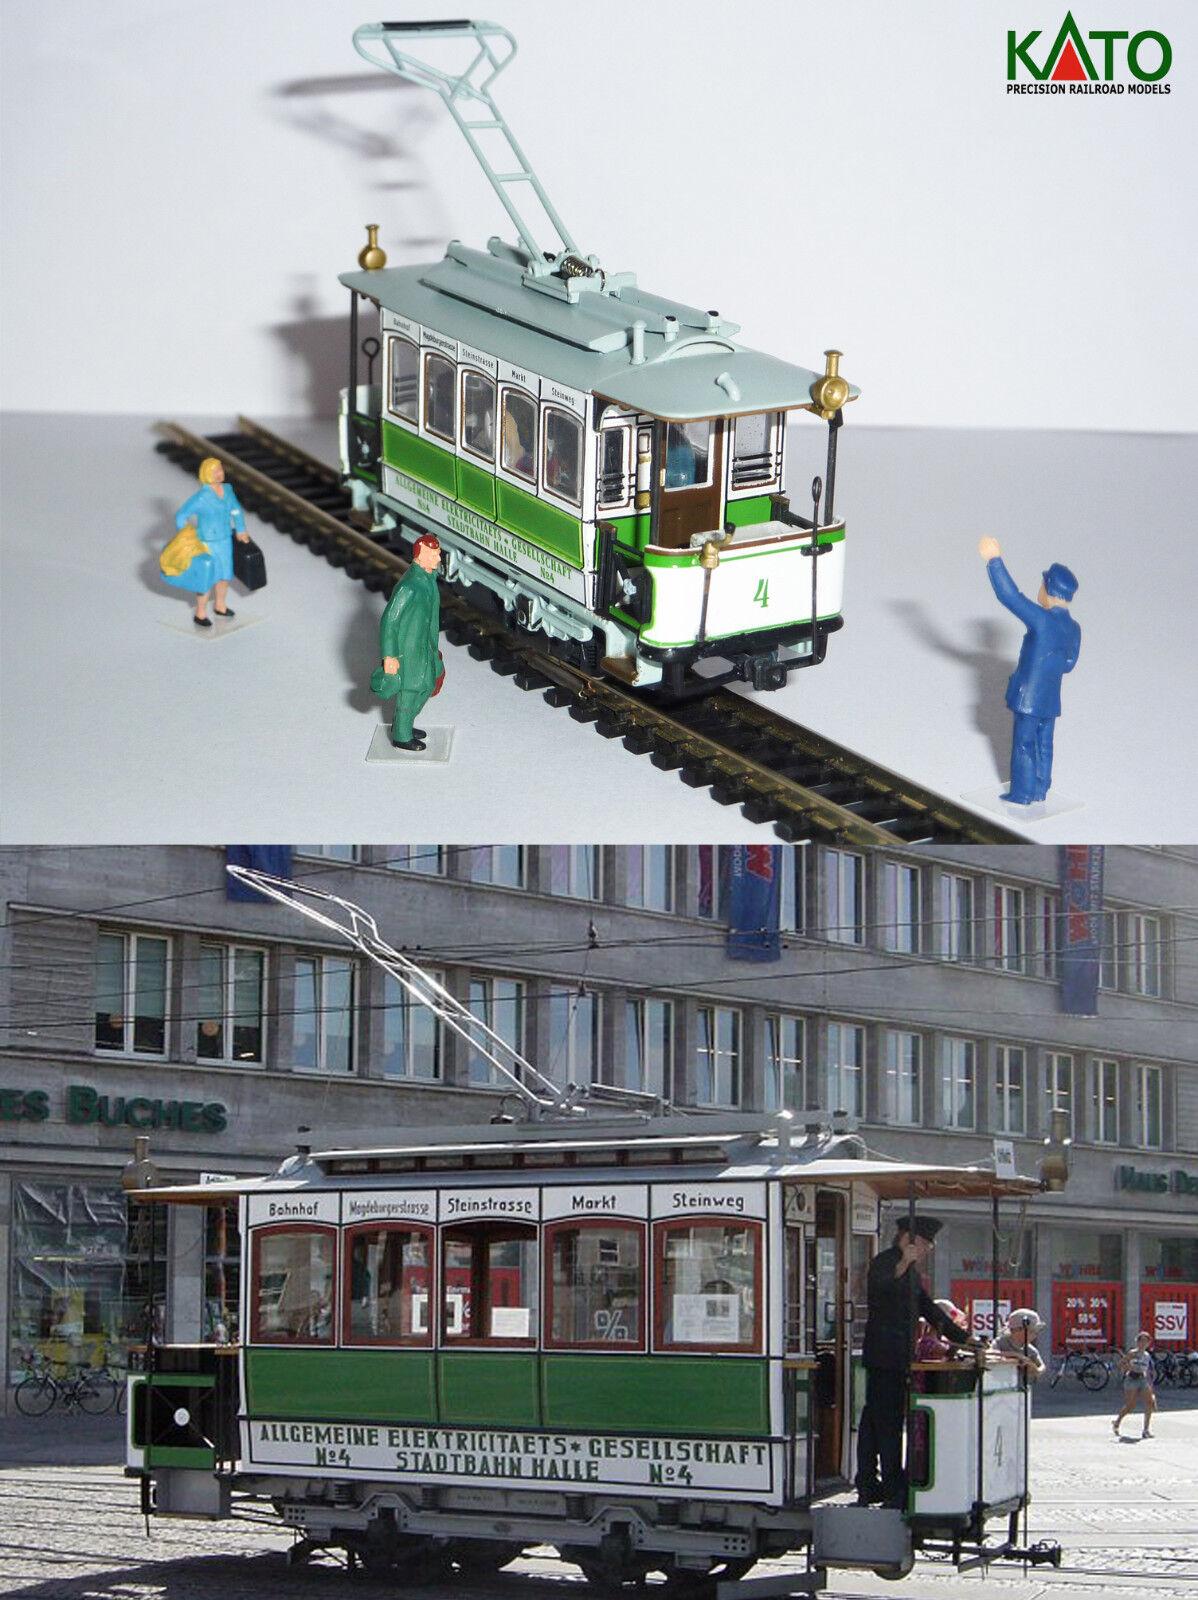 Motrice TW4 tram  AEG  - 1894 HO/N gauge  HOe  - motorized figures KATO ATLAS